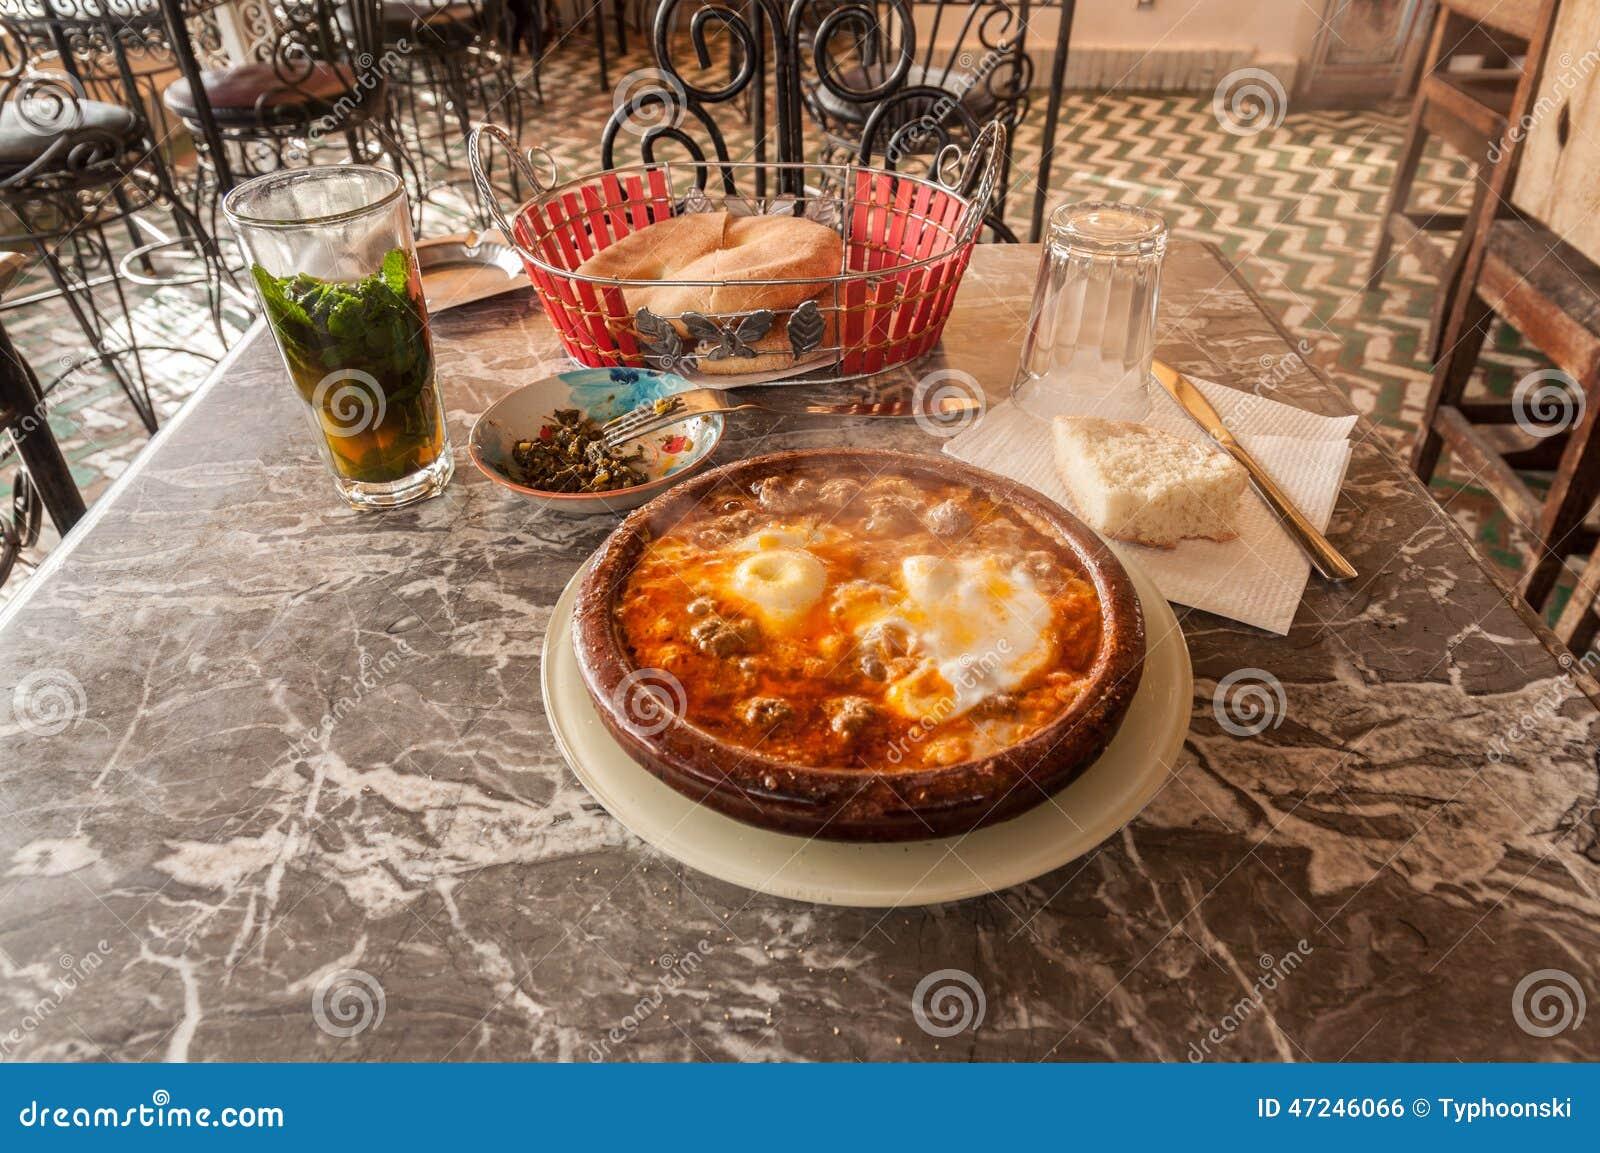 tajine dans un restaurant marocain traditionnel photo stock image 47246066. Black Bedroom Furniture Sets. Home Design Ideas